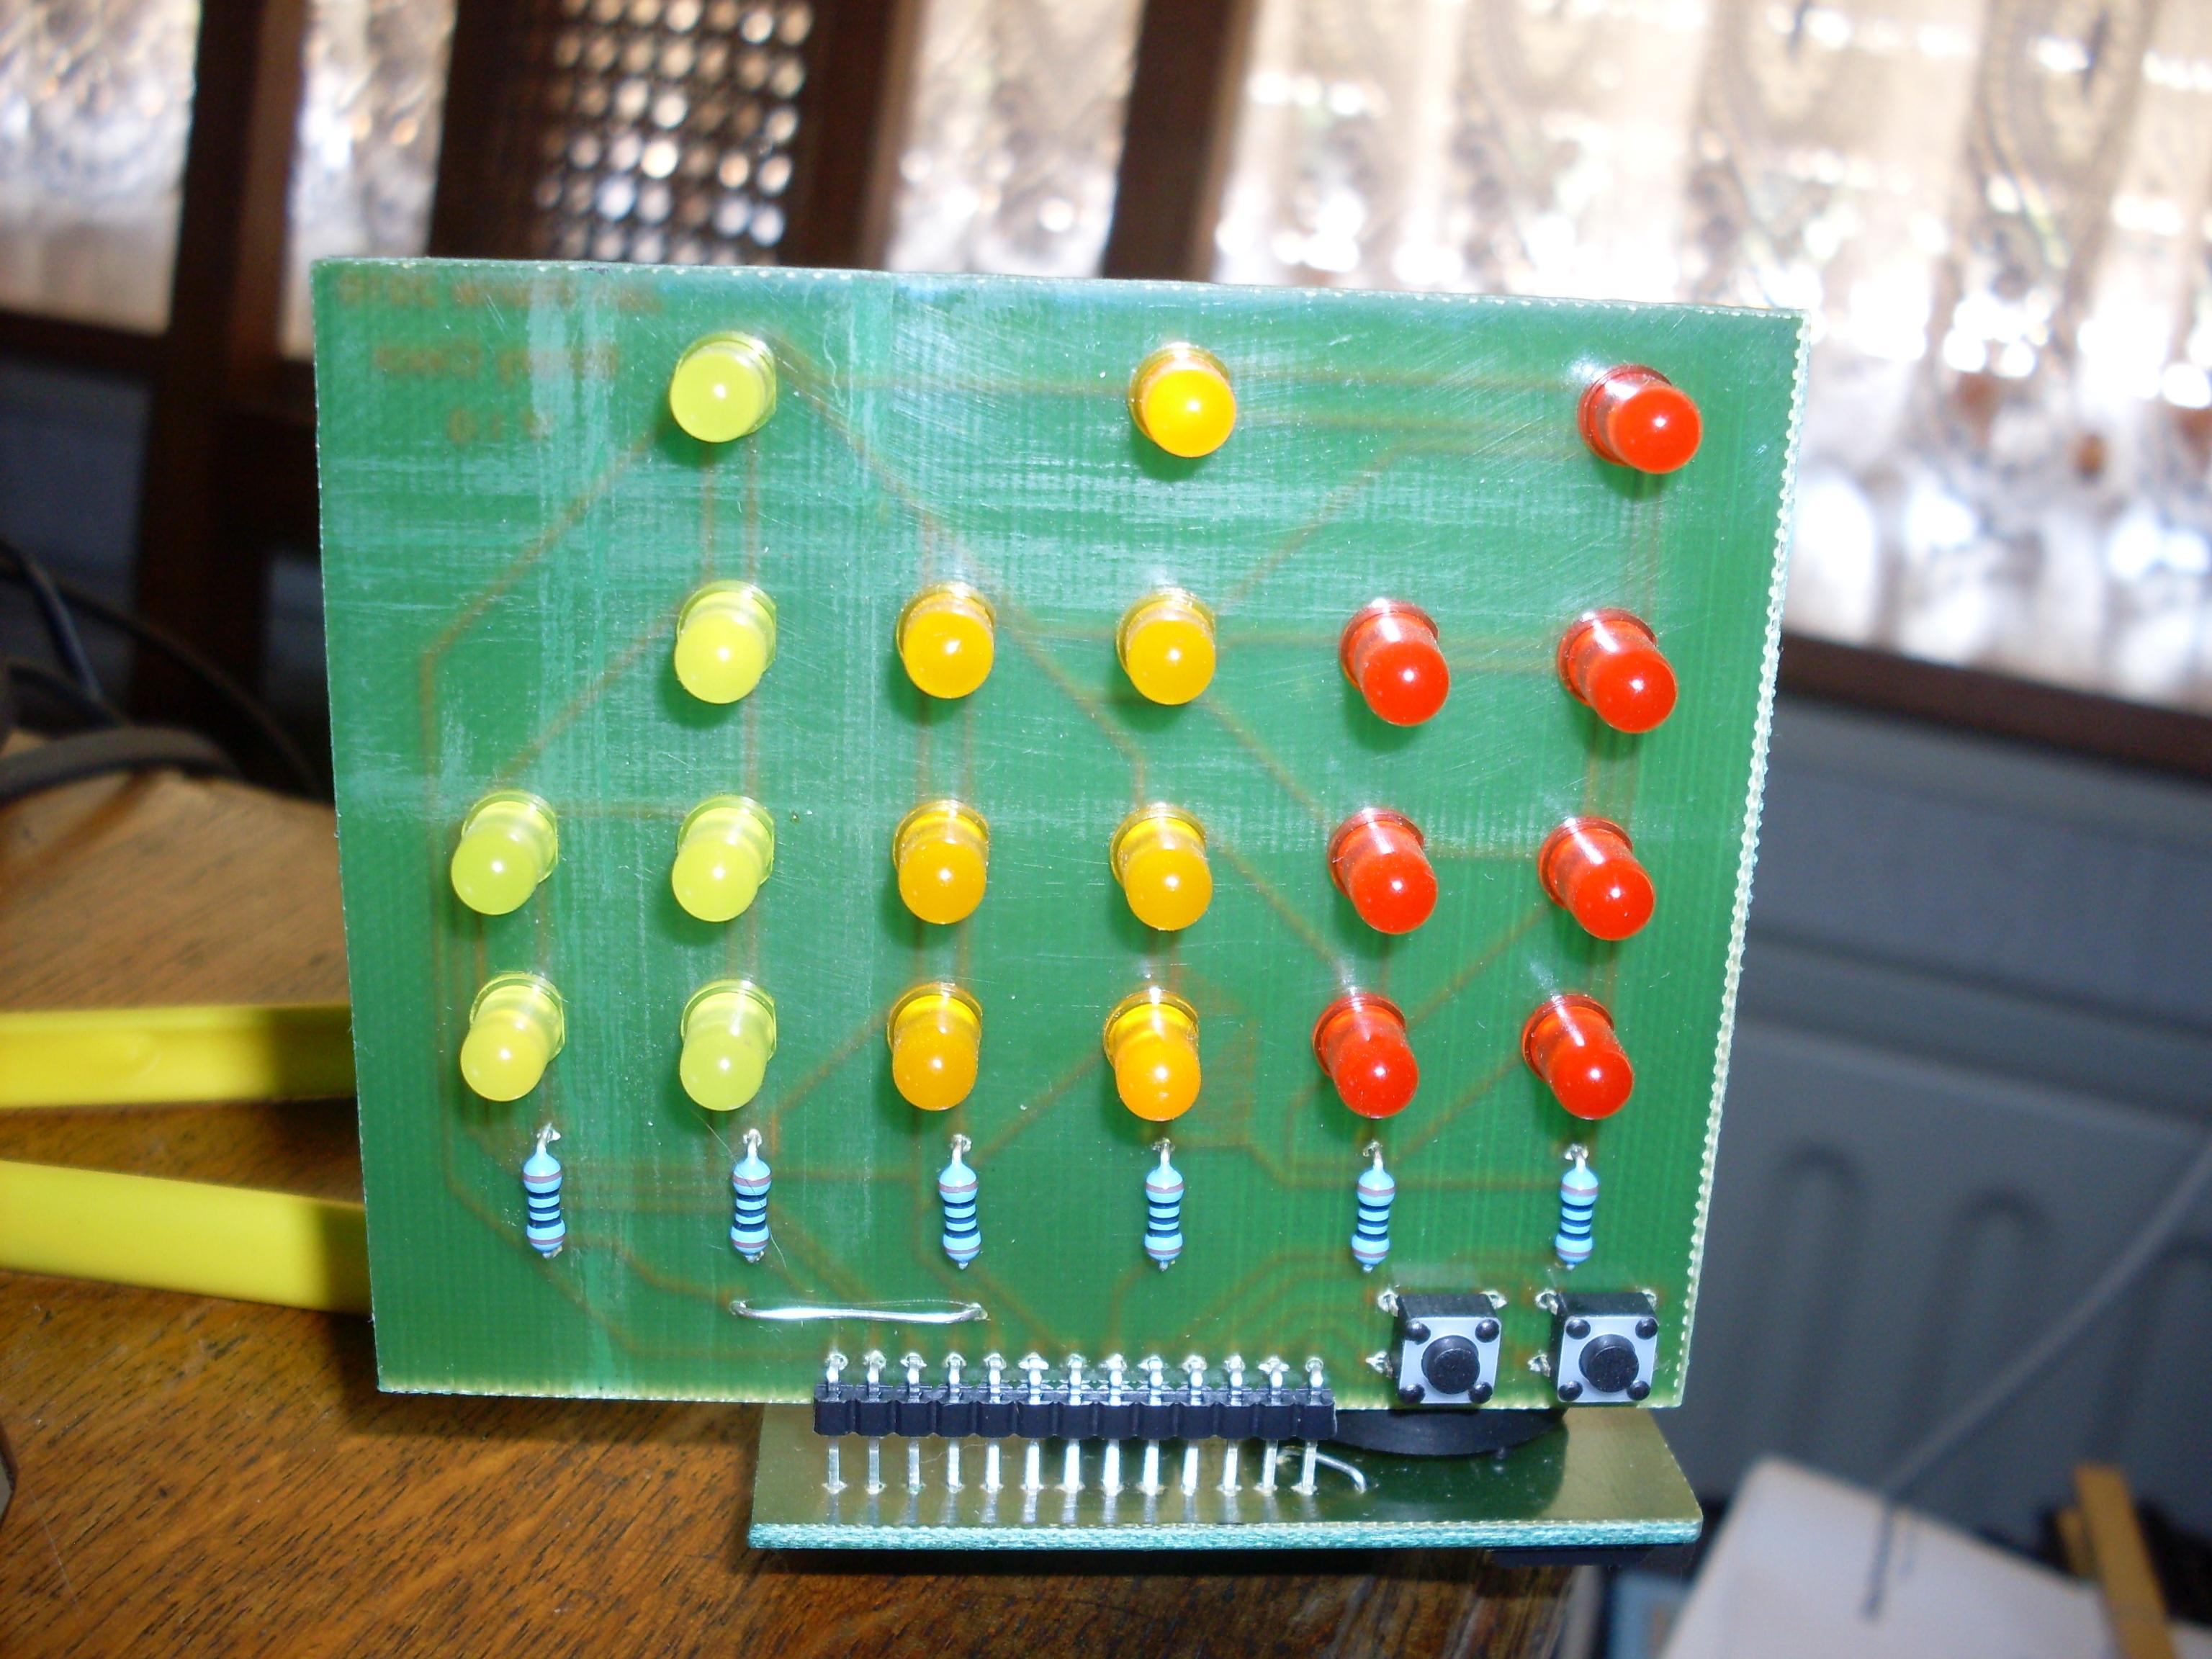 A simple USB-powered binary clock